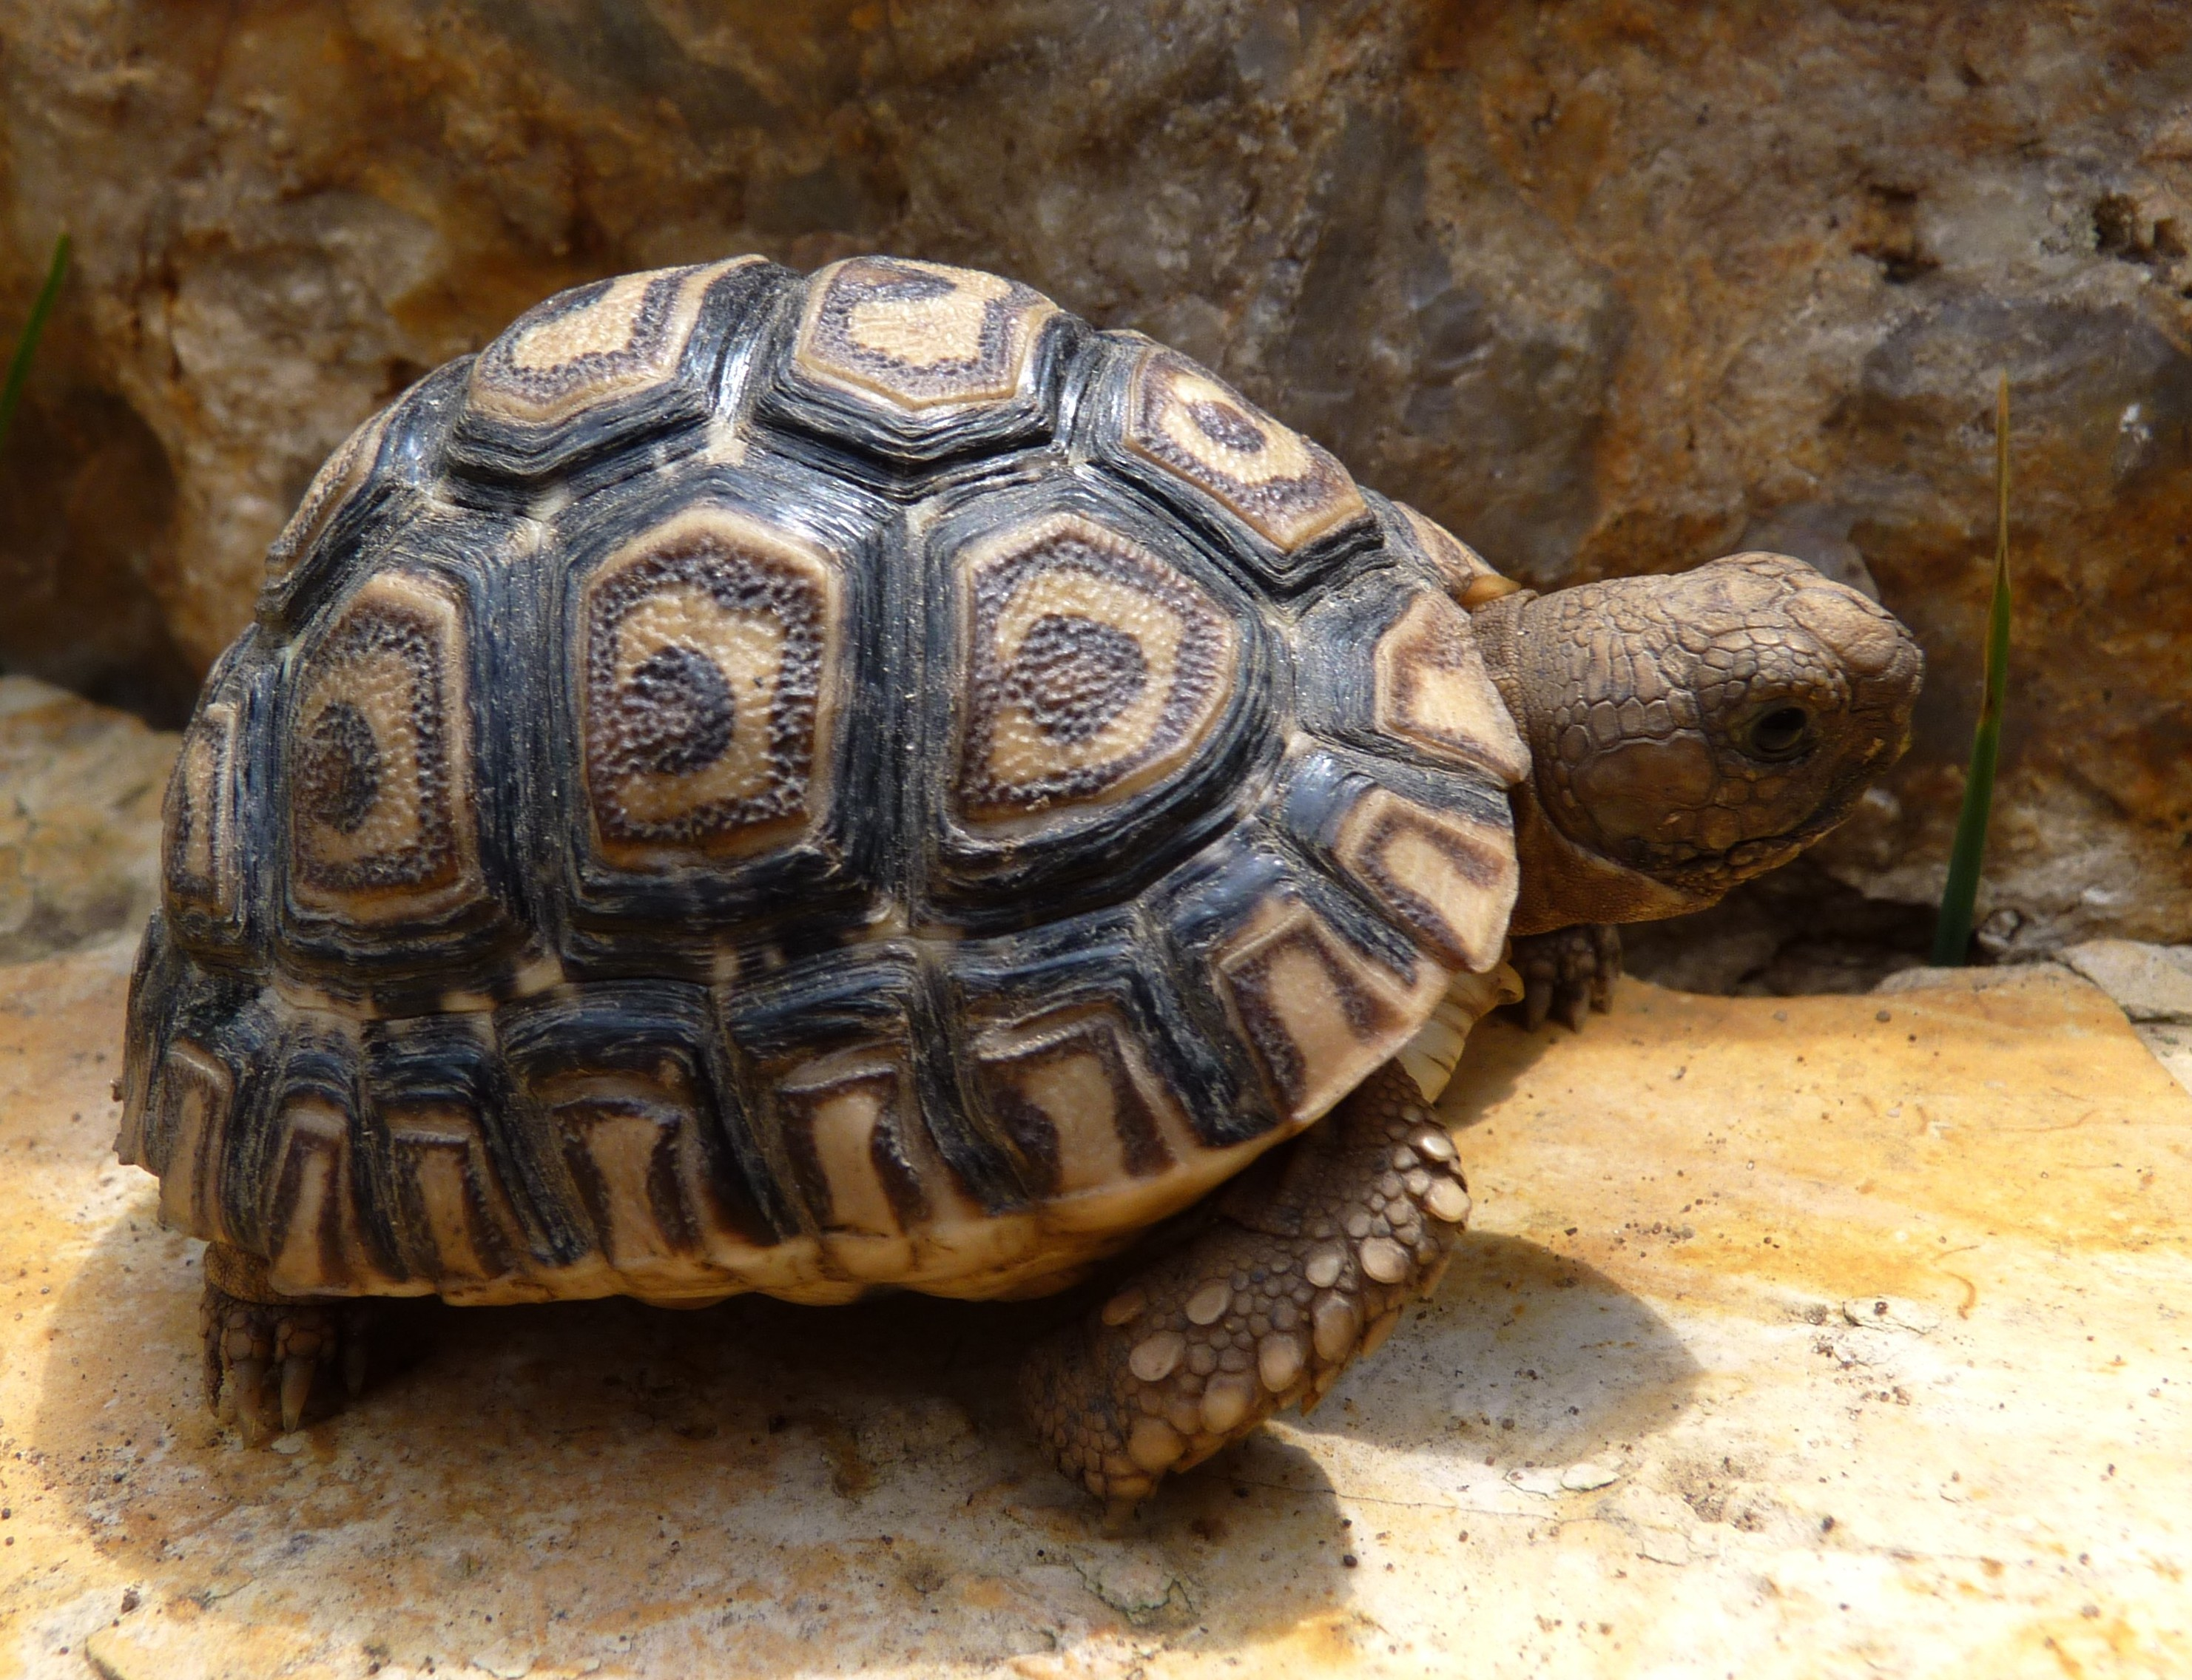 Leopard Tortoise HD wallpapers, Desktop wallpaper - most viewed